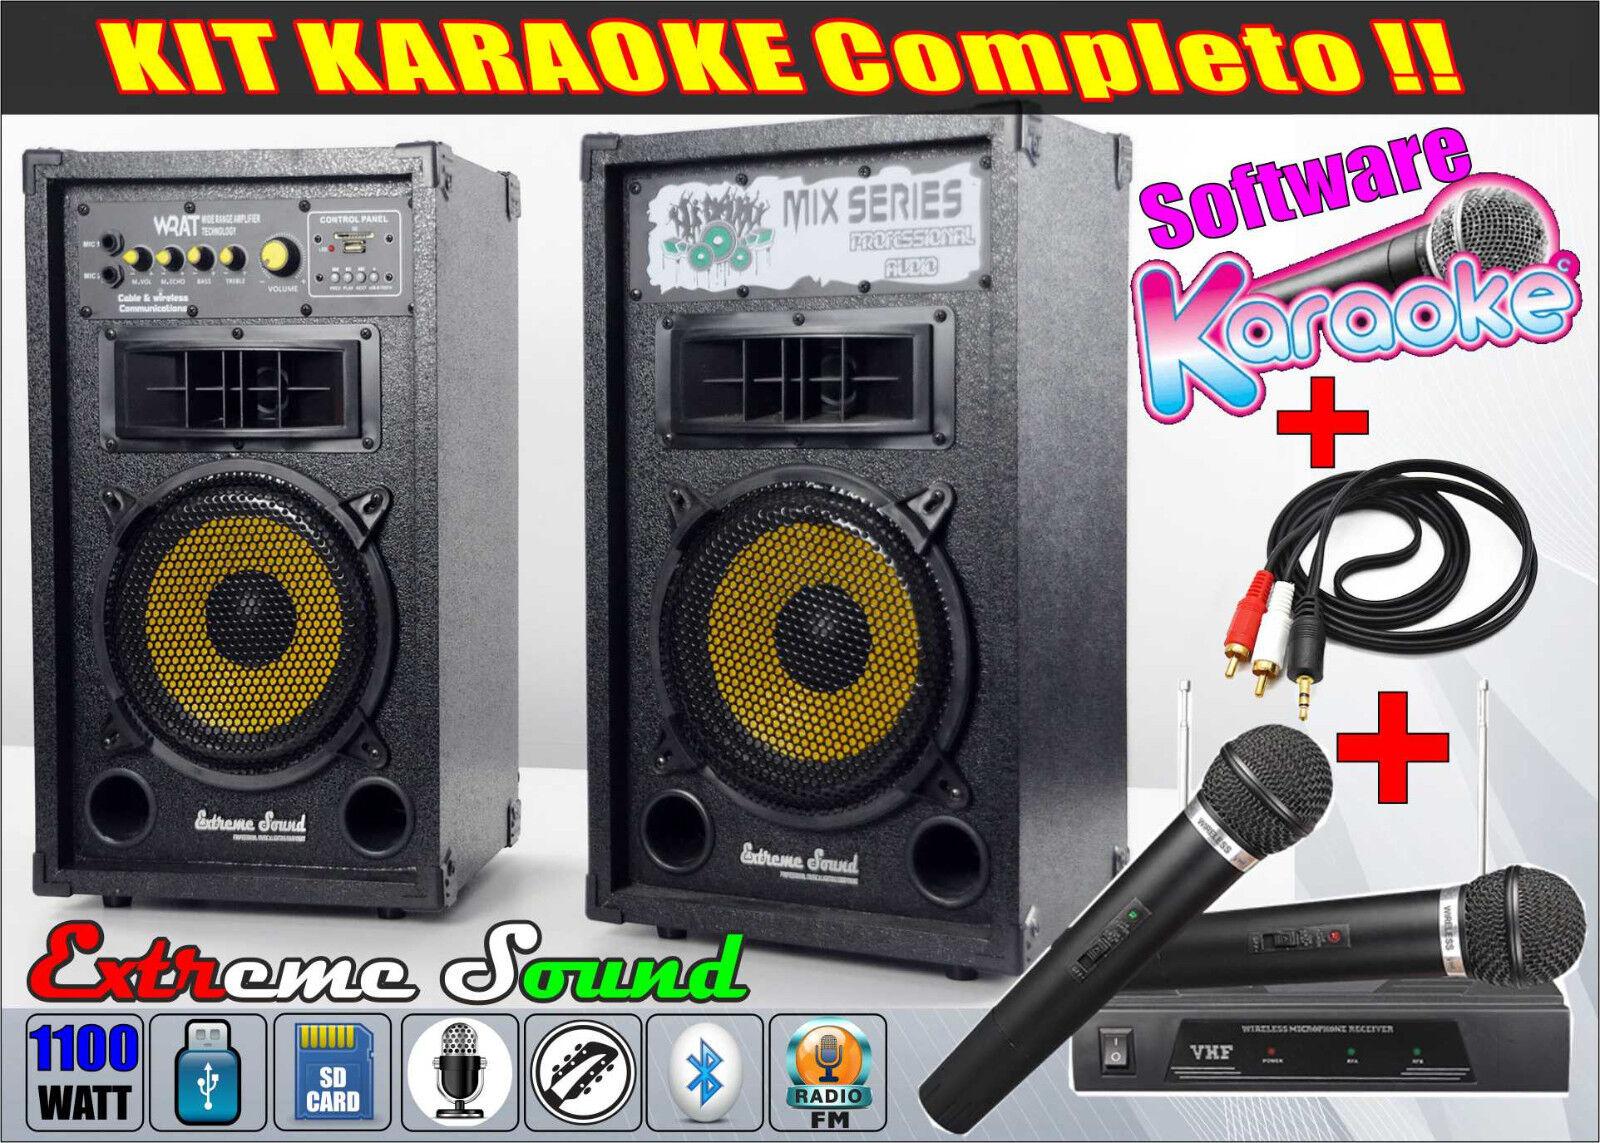 IMPIANTO 2 CASSE per KARAOKE 1100W microfoni Wireless Cavo PC software MIX-1-KIT